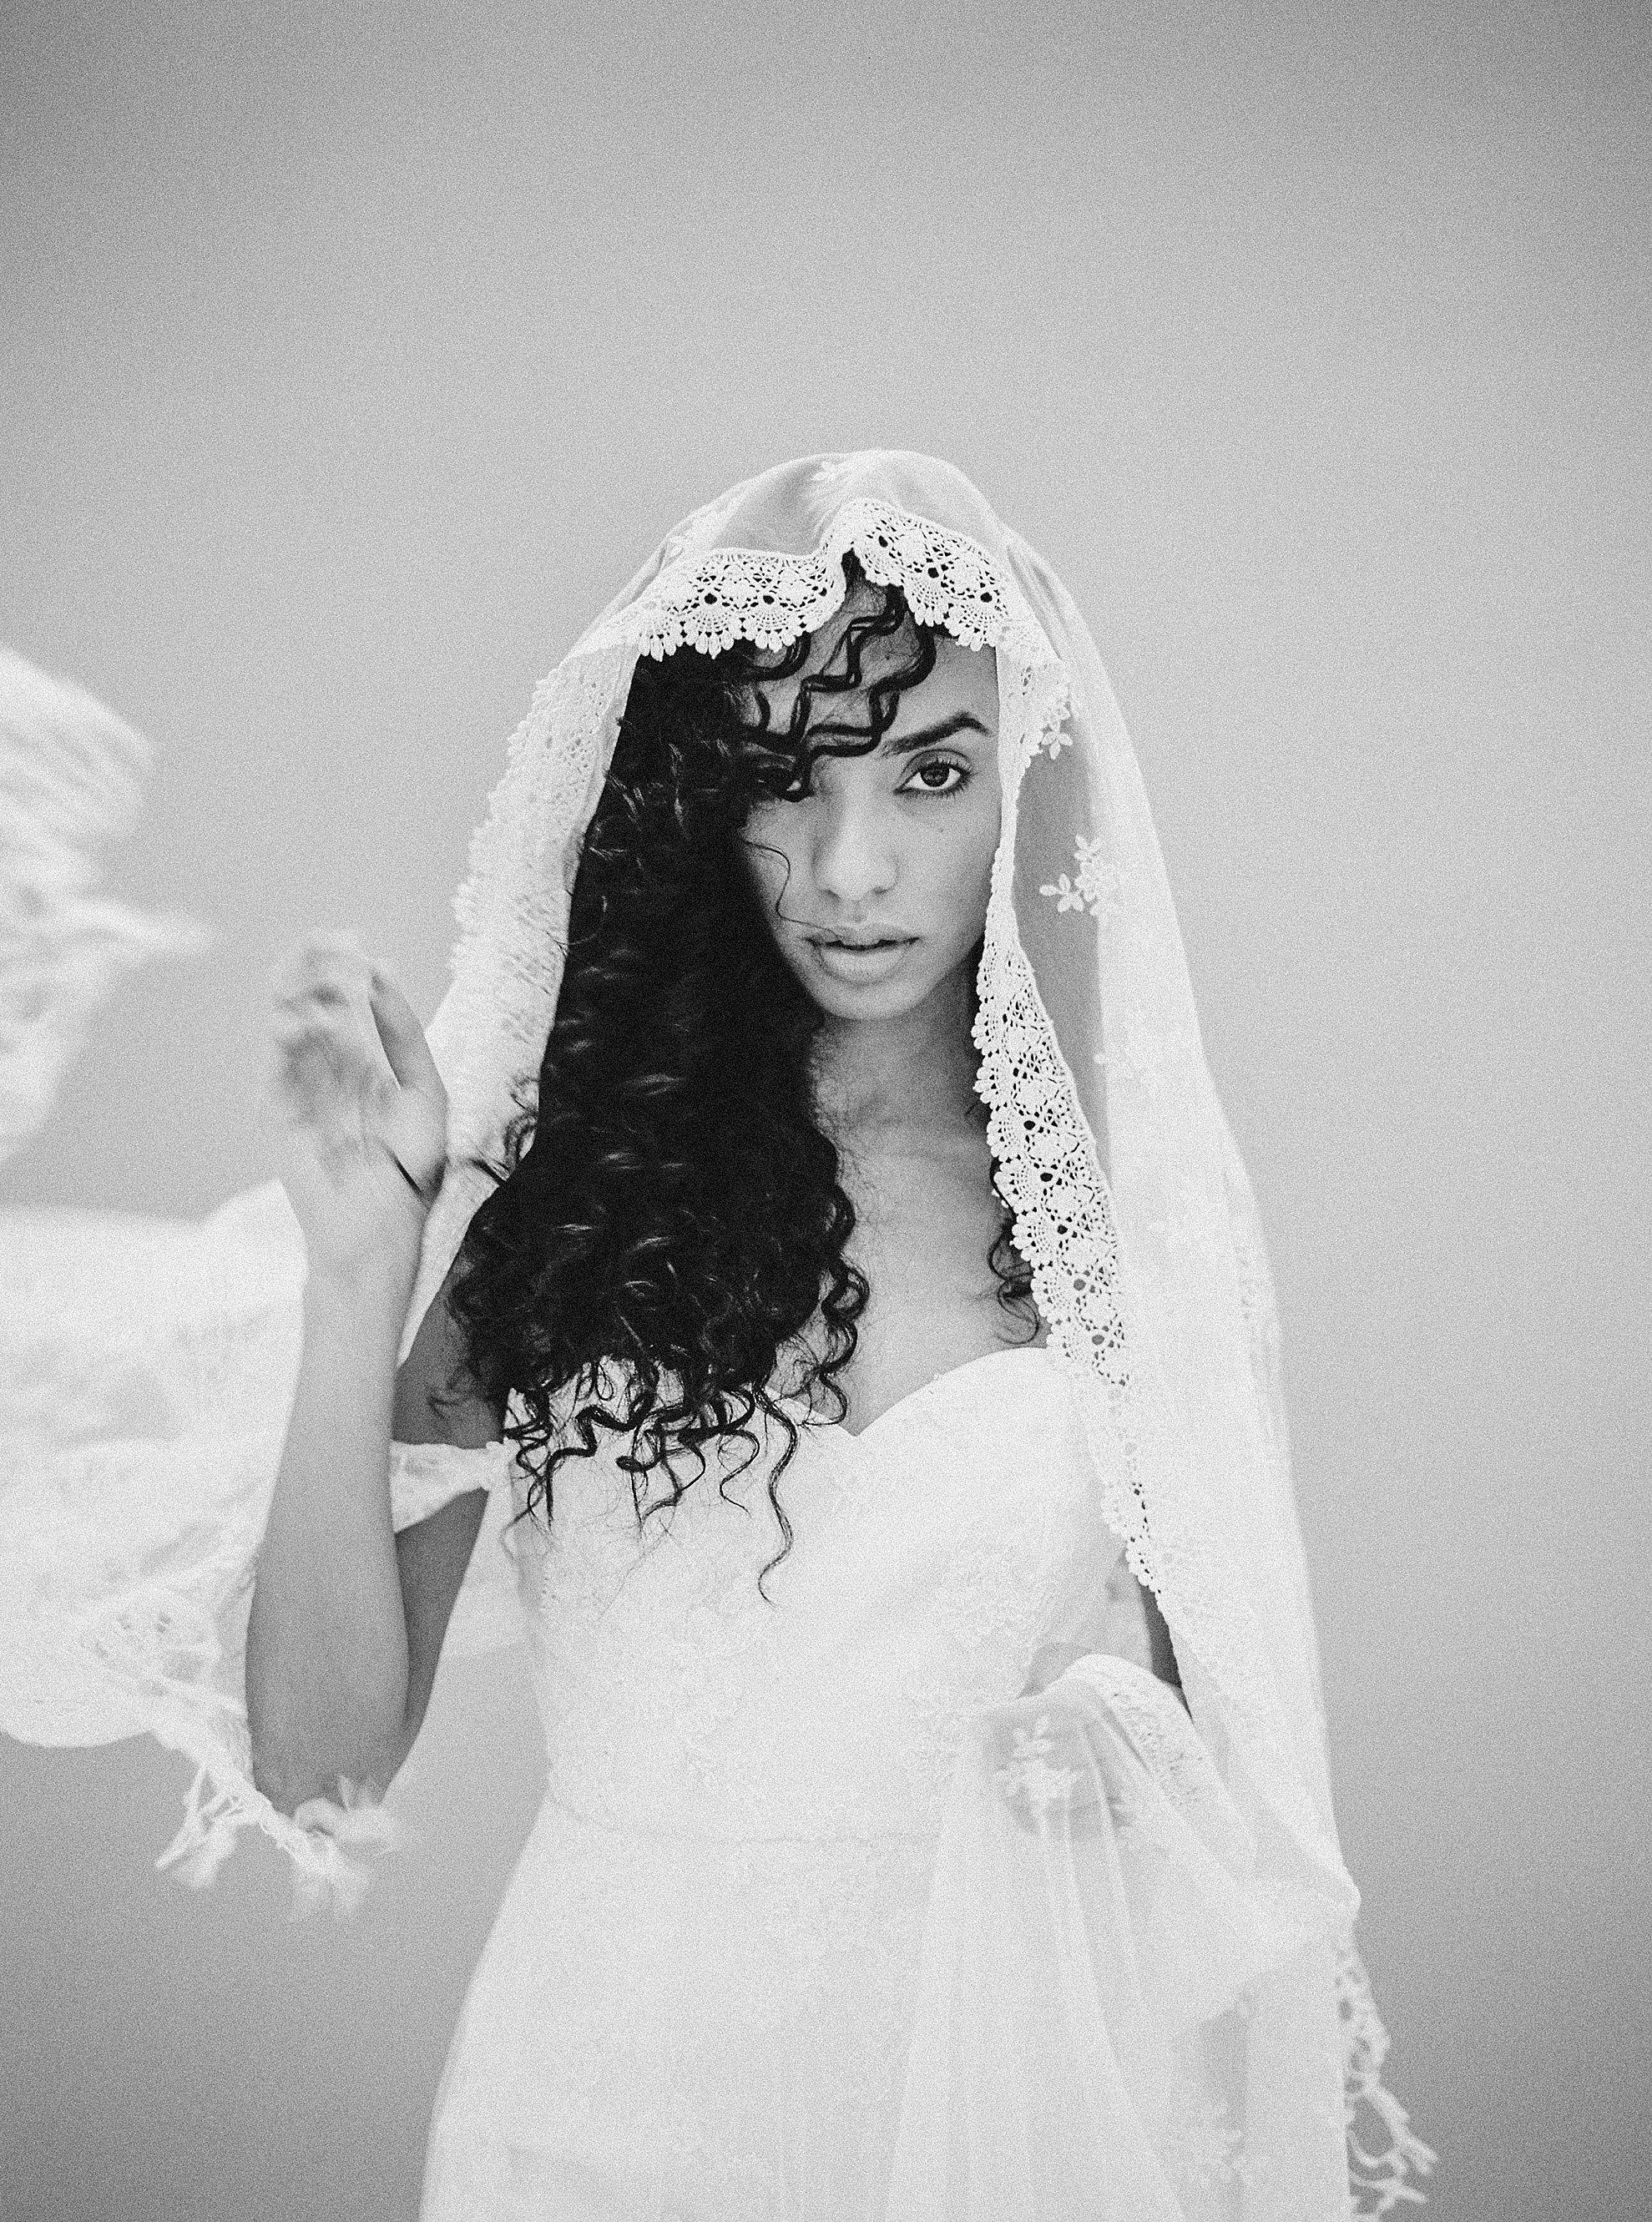 Amanda-Drost-Fotografie-mode-fashion-editorial-bridal_0006.jpg